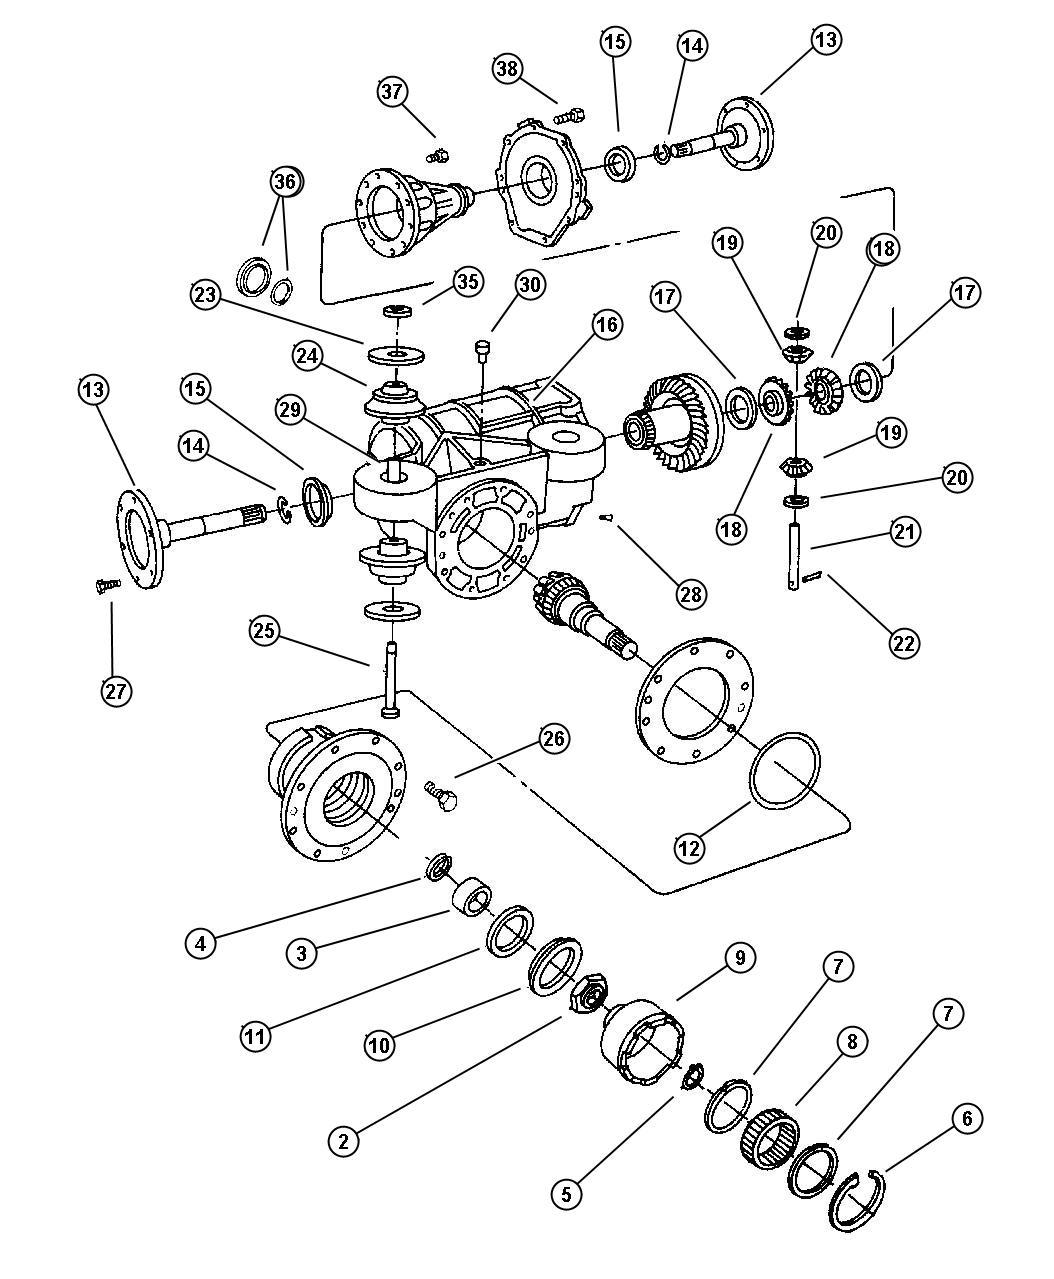 2006 chrysler 300 radiator cooling fan diagram image details